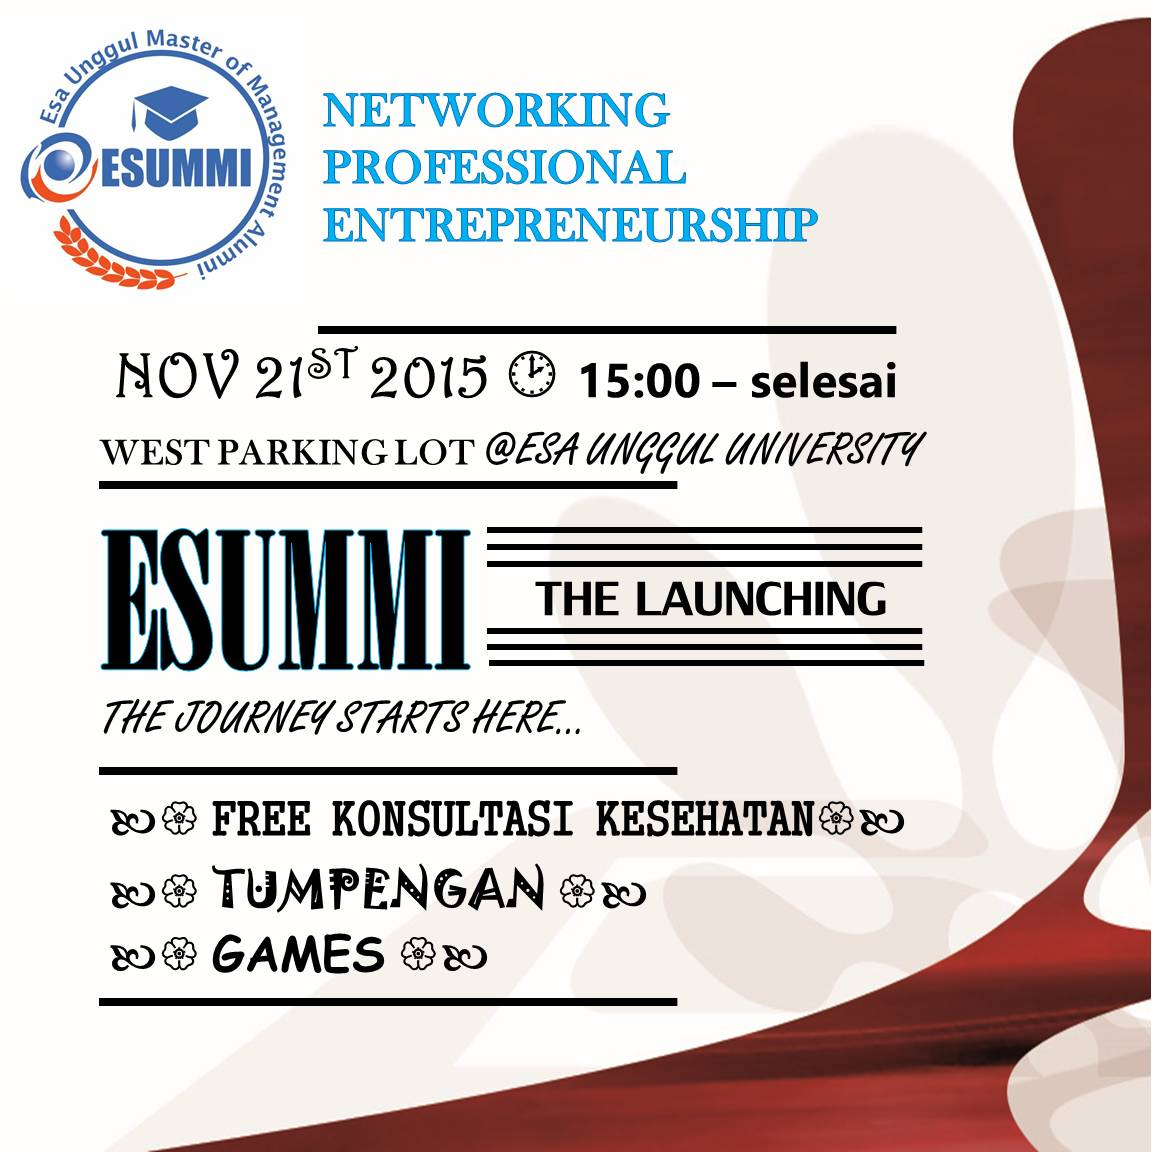 Universitas Esa Unggul Master of Management Alumni (ESUMMI) Menyelenggarakan Networking Professional Entrepreneurship